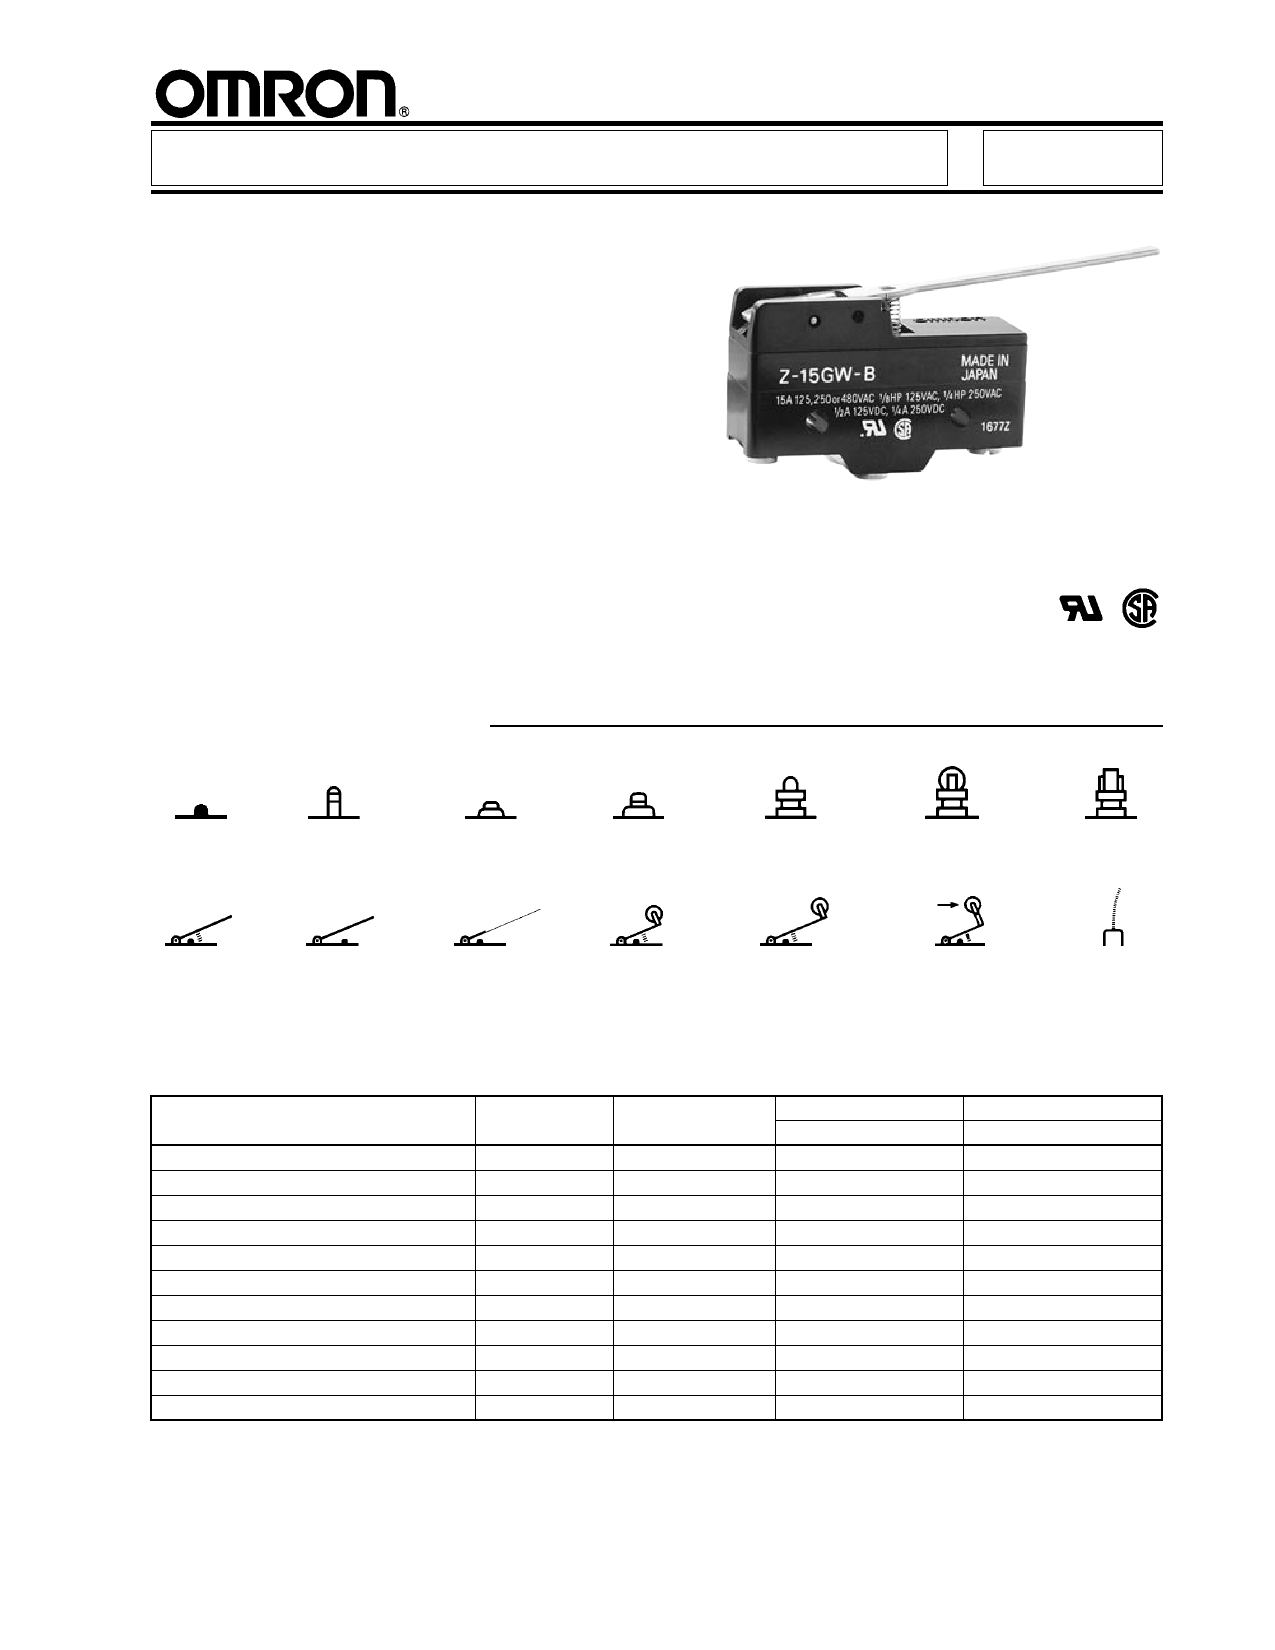 Z-15G-B datasheet